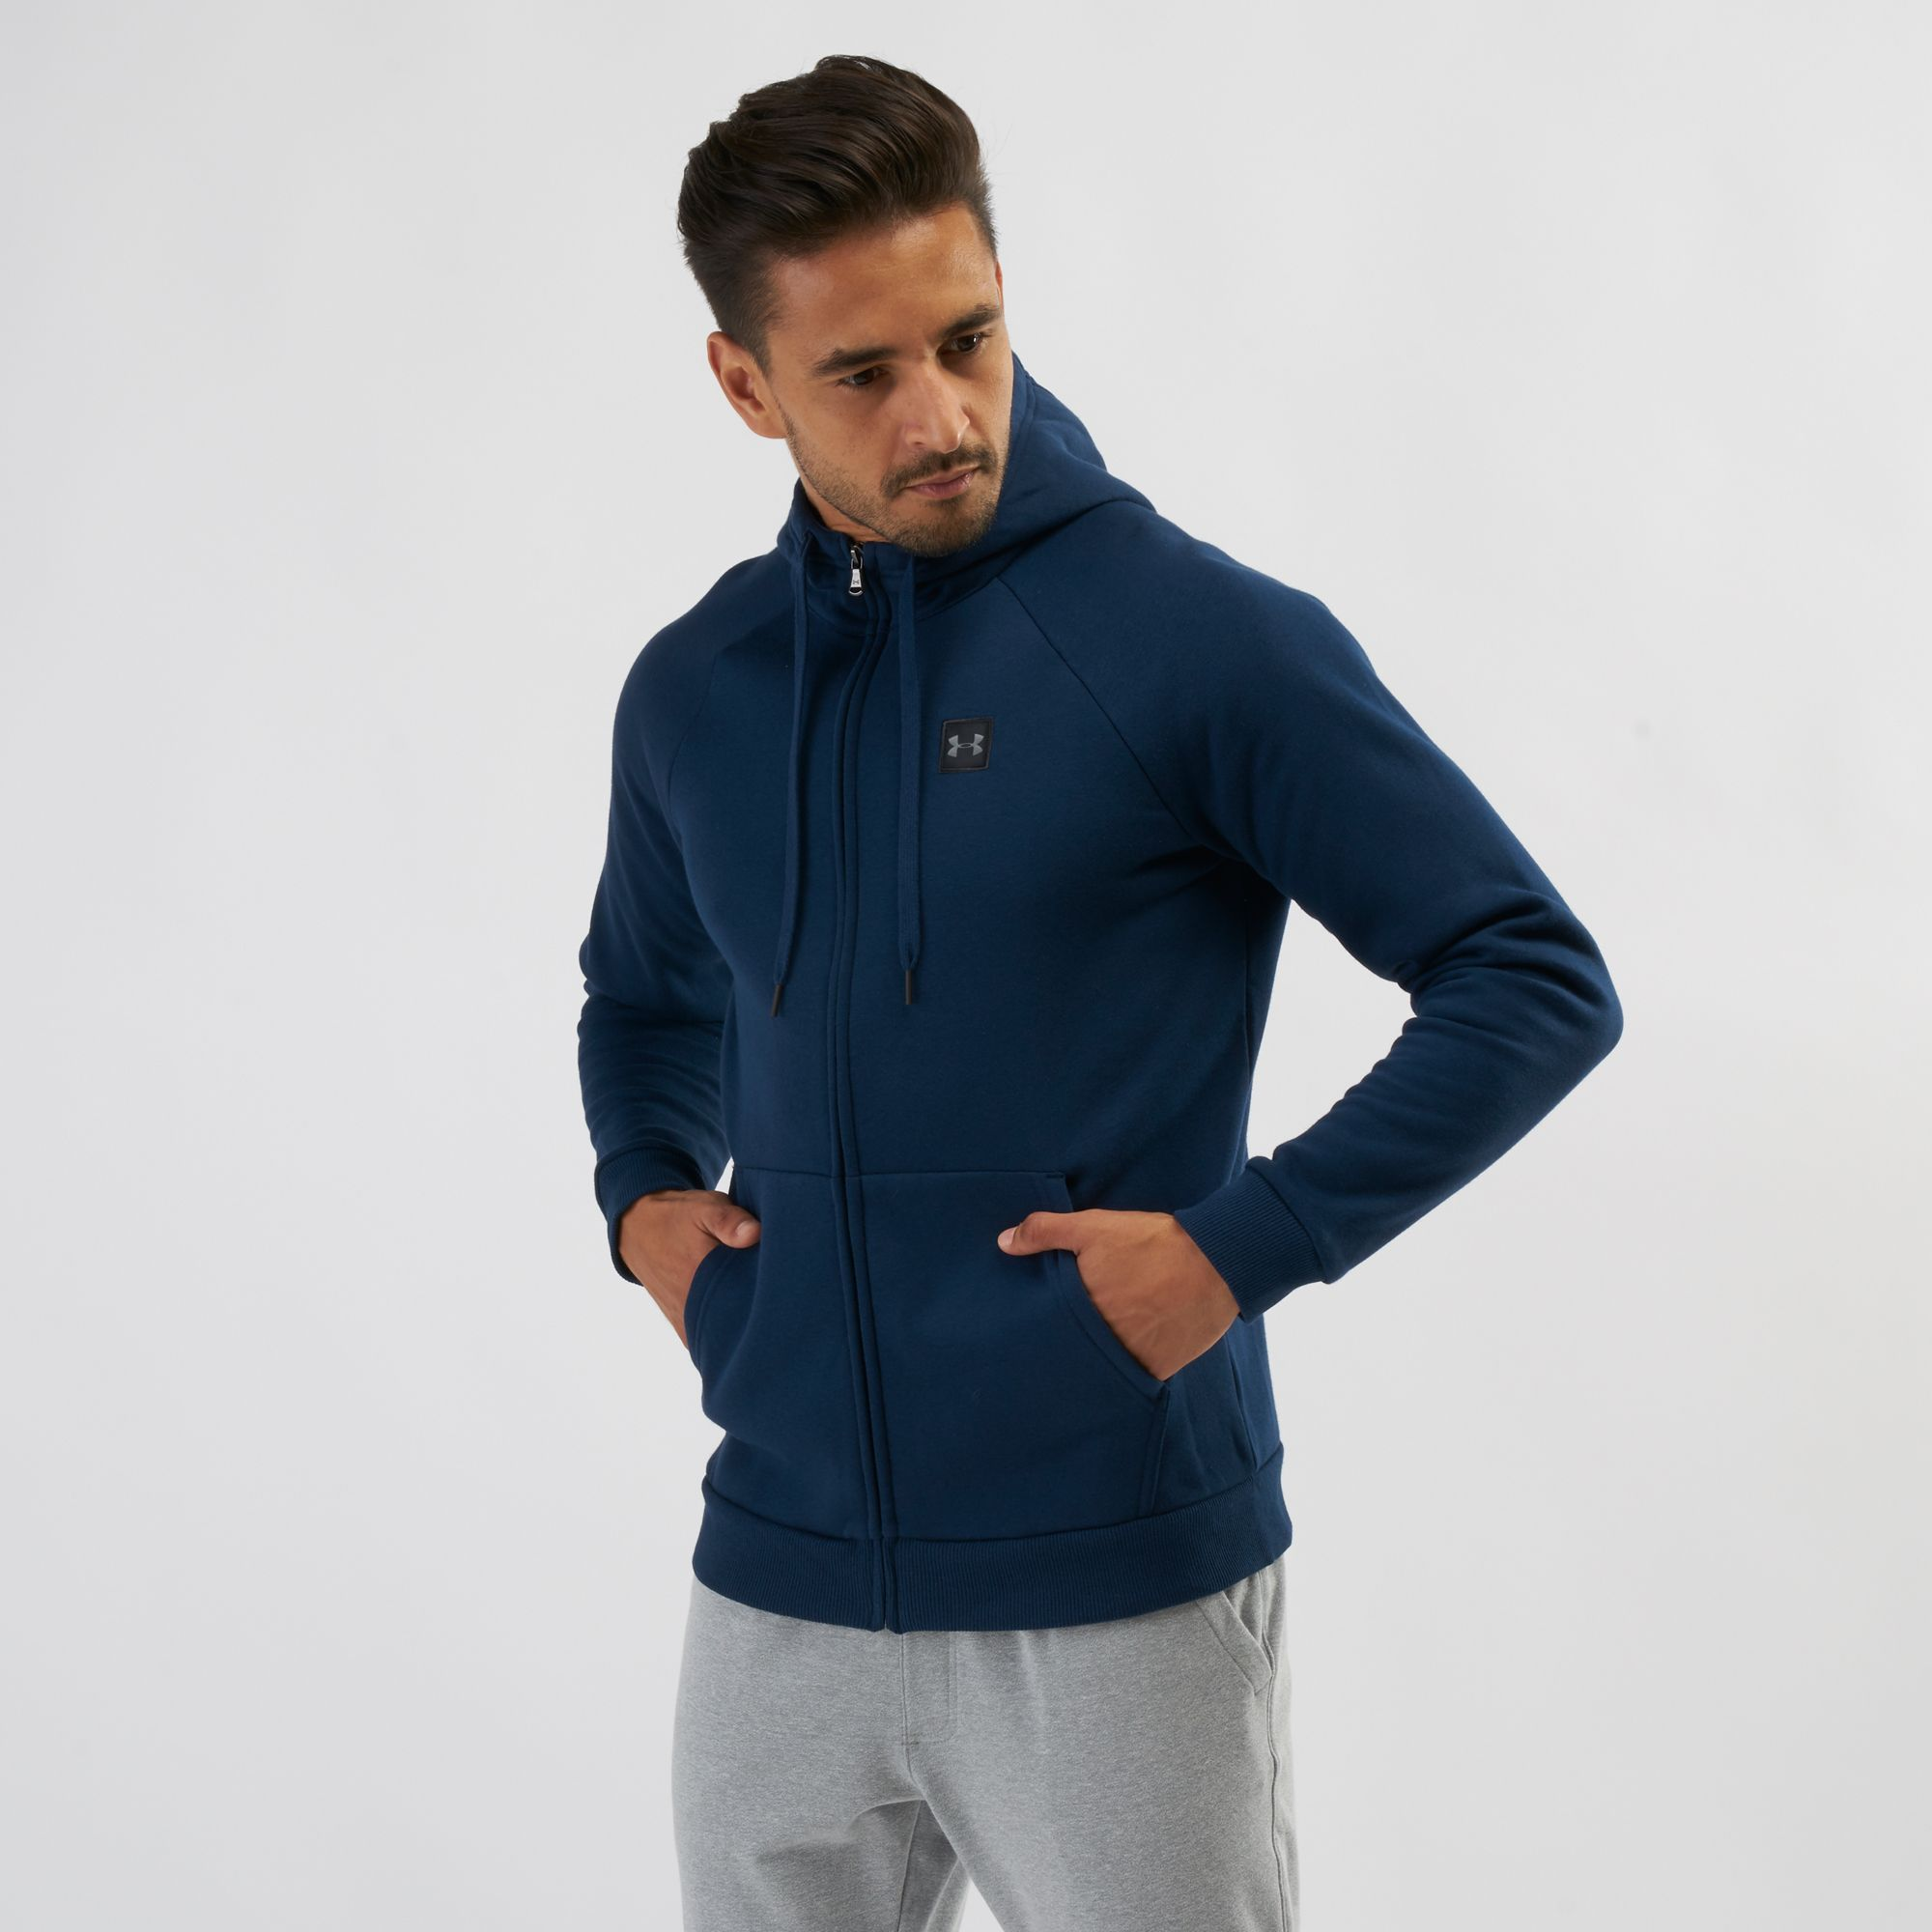 e8cced3c5 Shop Blue Under Armour Rival Fleece Full Zip Jacket   Hoodies ...